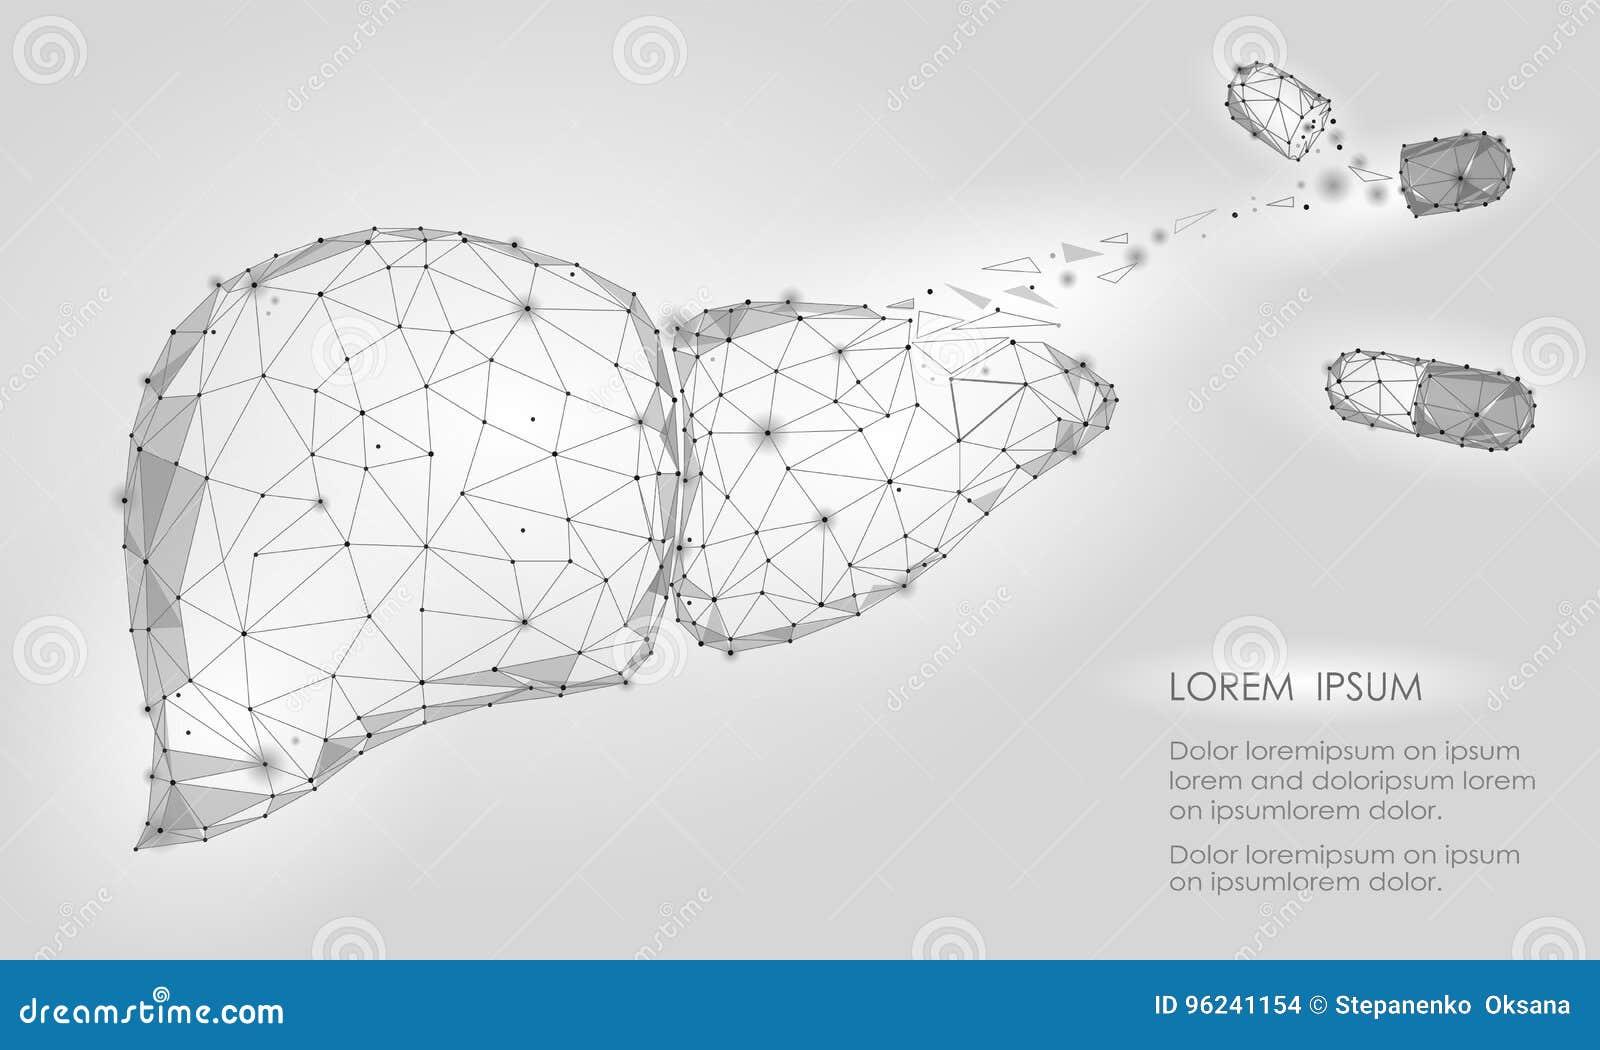 Treatment Regeneration Decay Human Liver Internal Organ Triangle Low